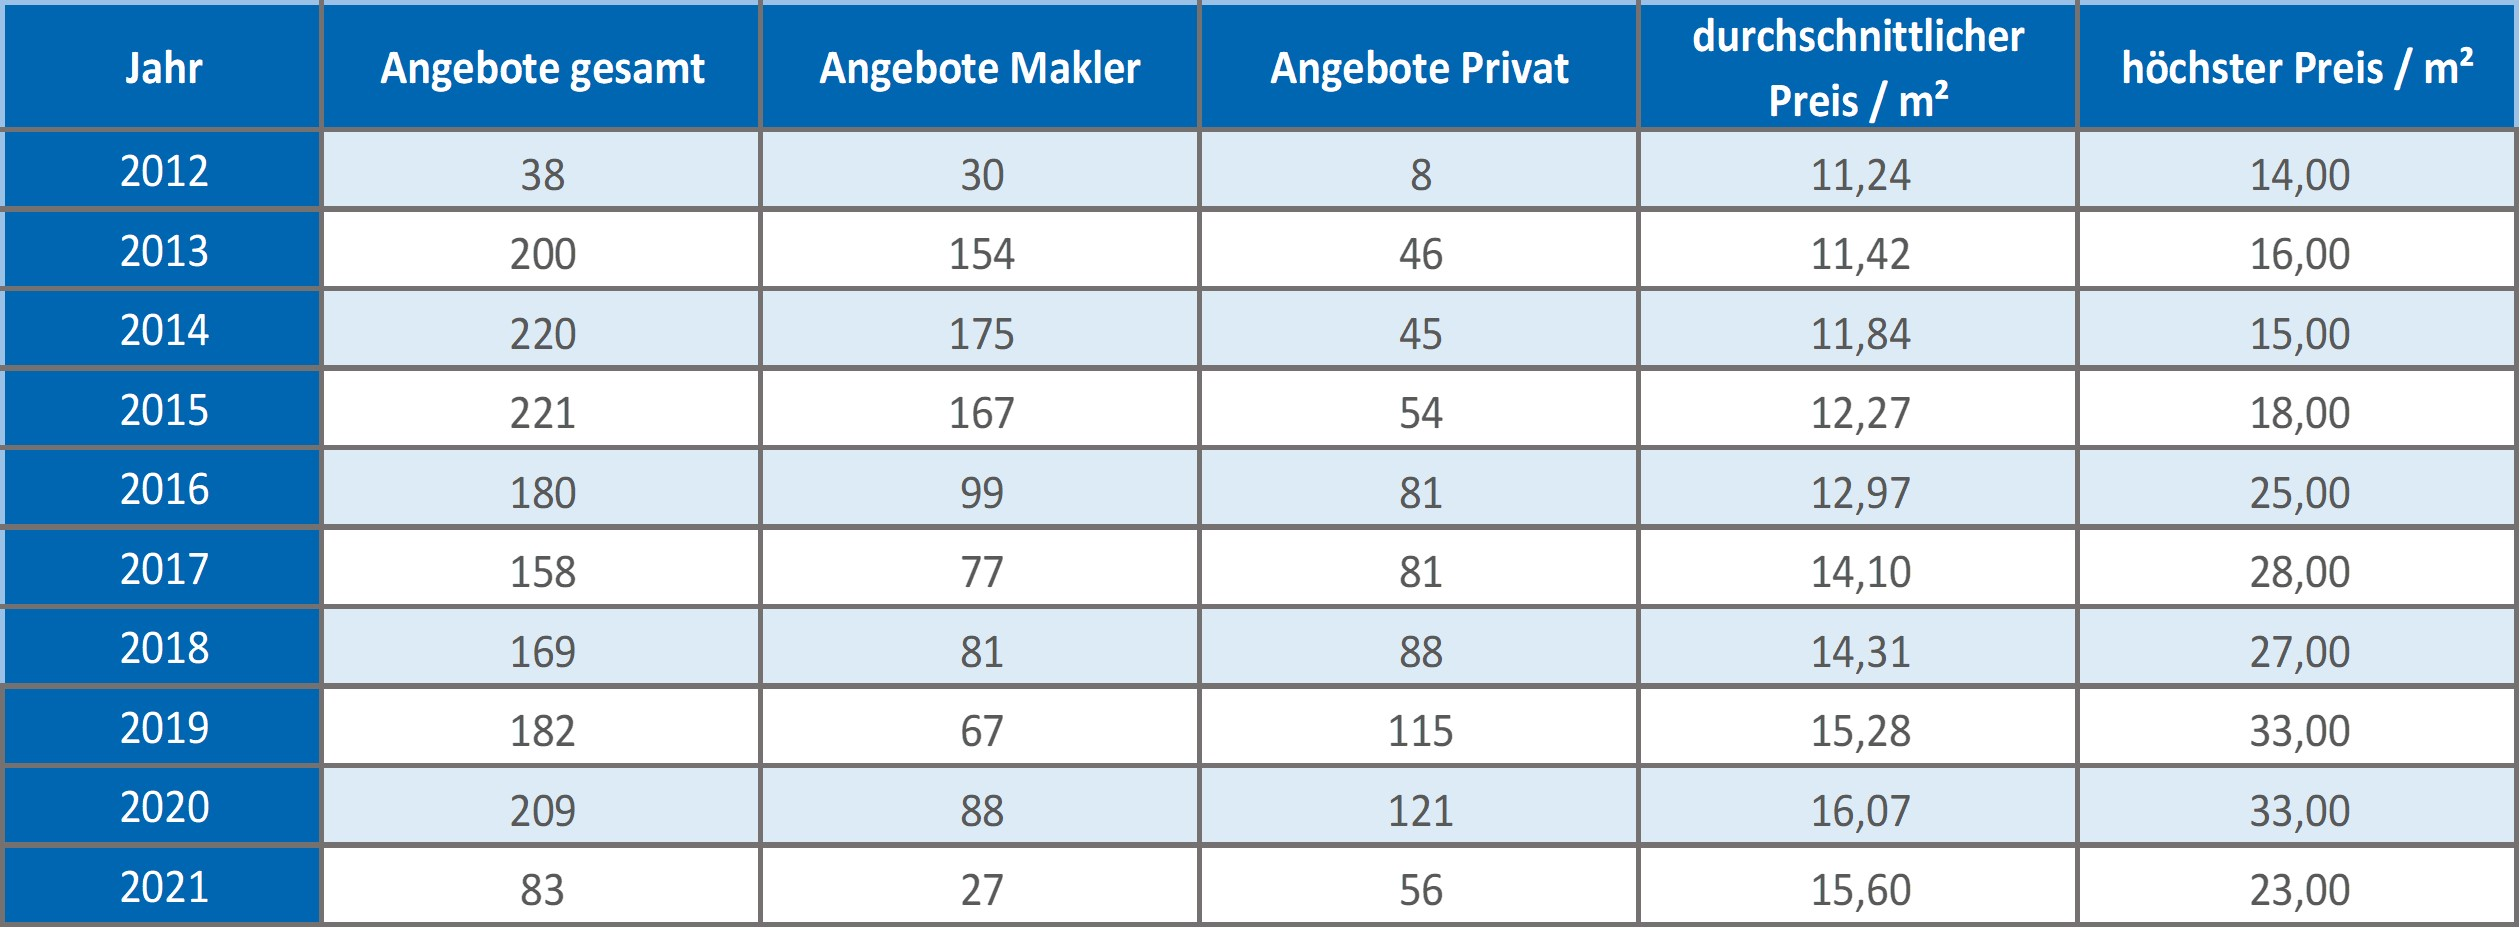 Oberhaching Wohnung mieten vermieten Preis Bewertung Makler www.happy-immo.de 2019 2020 2021